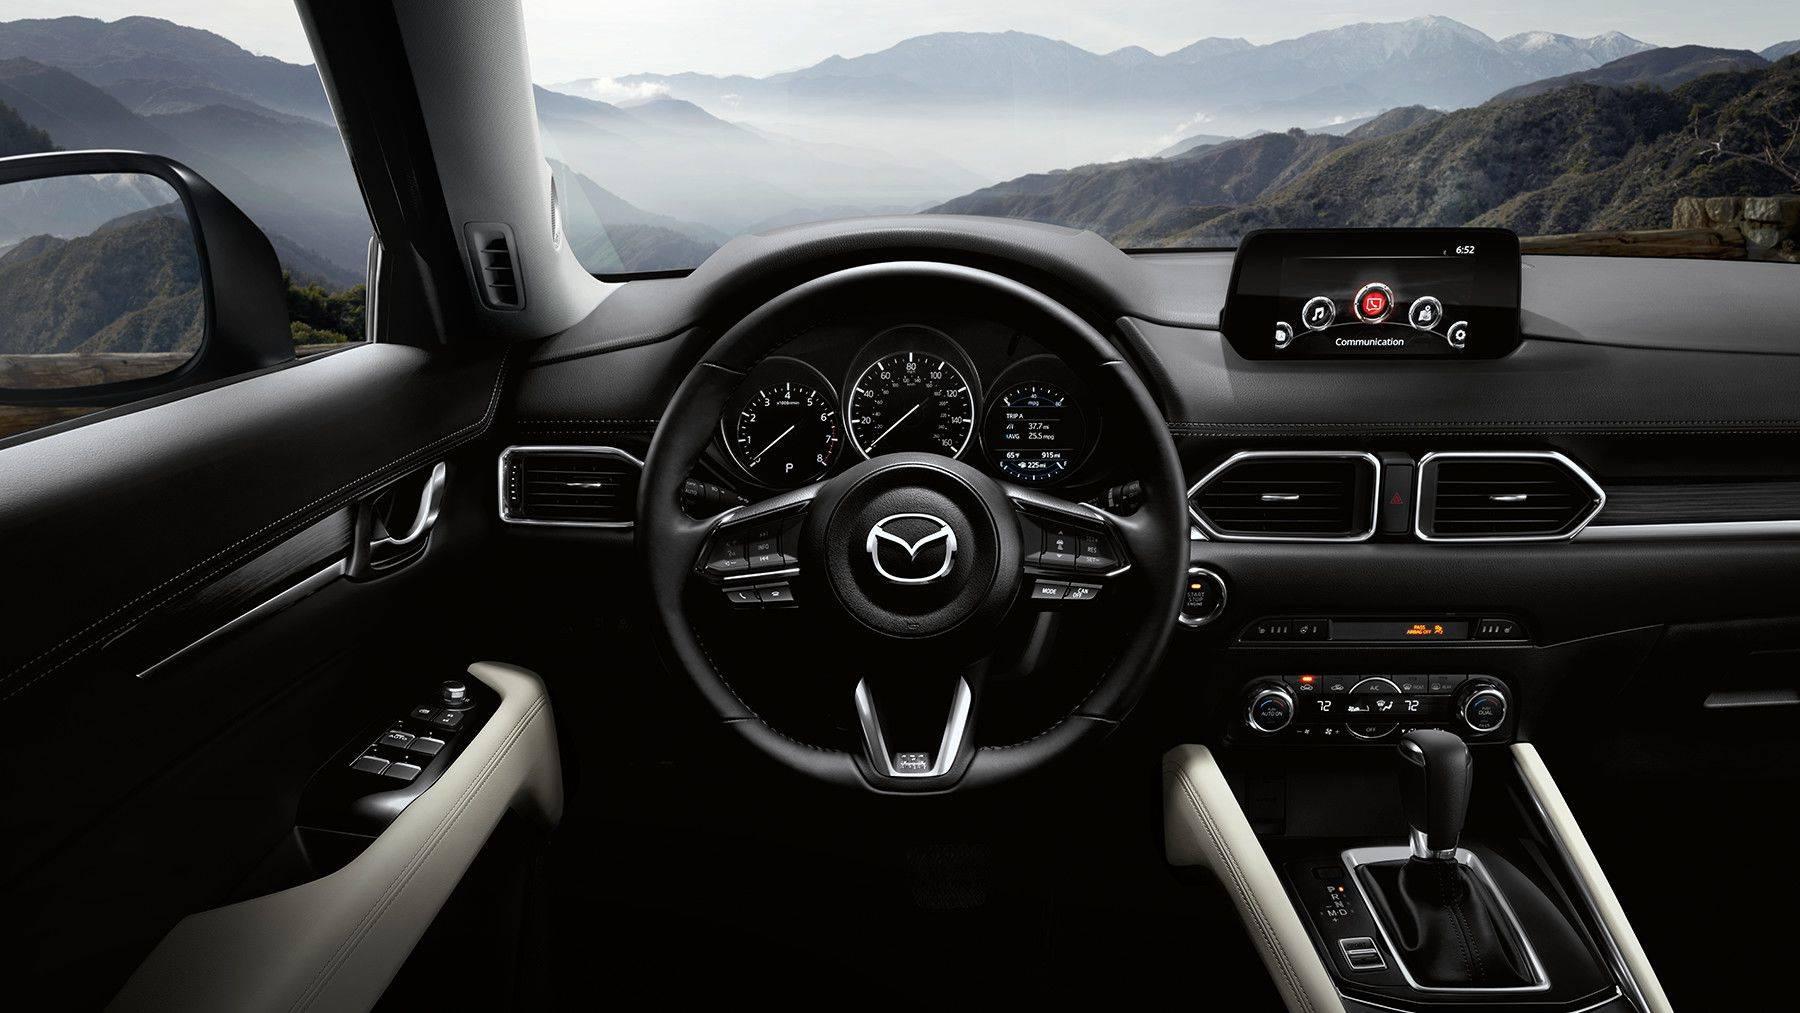 Dashboard in the 2018 Mazda CX-5